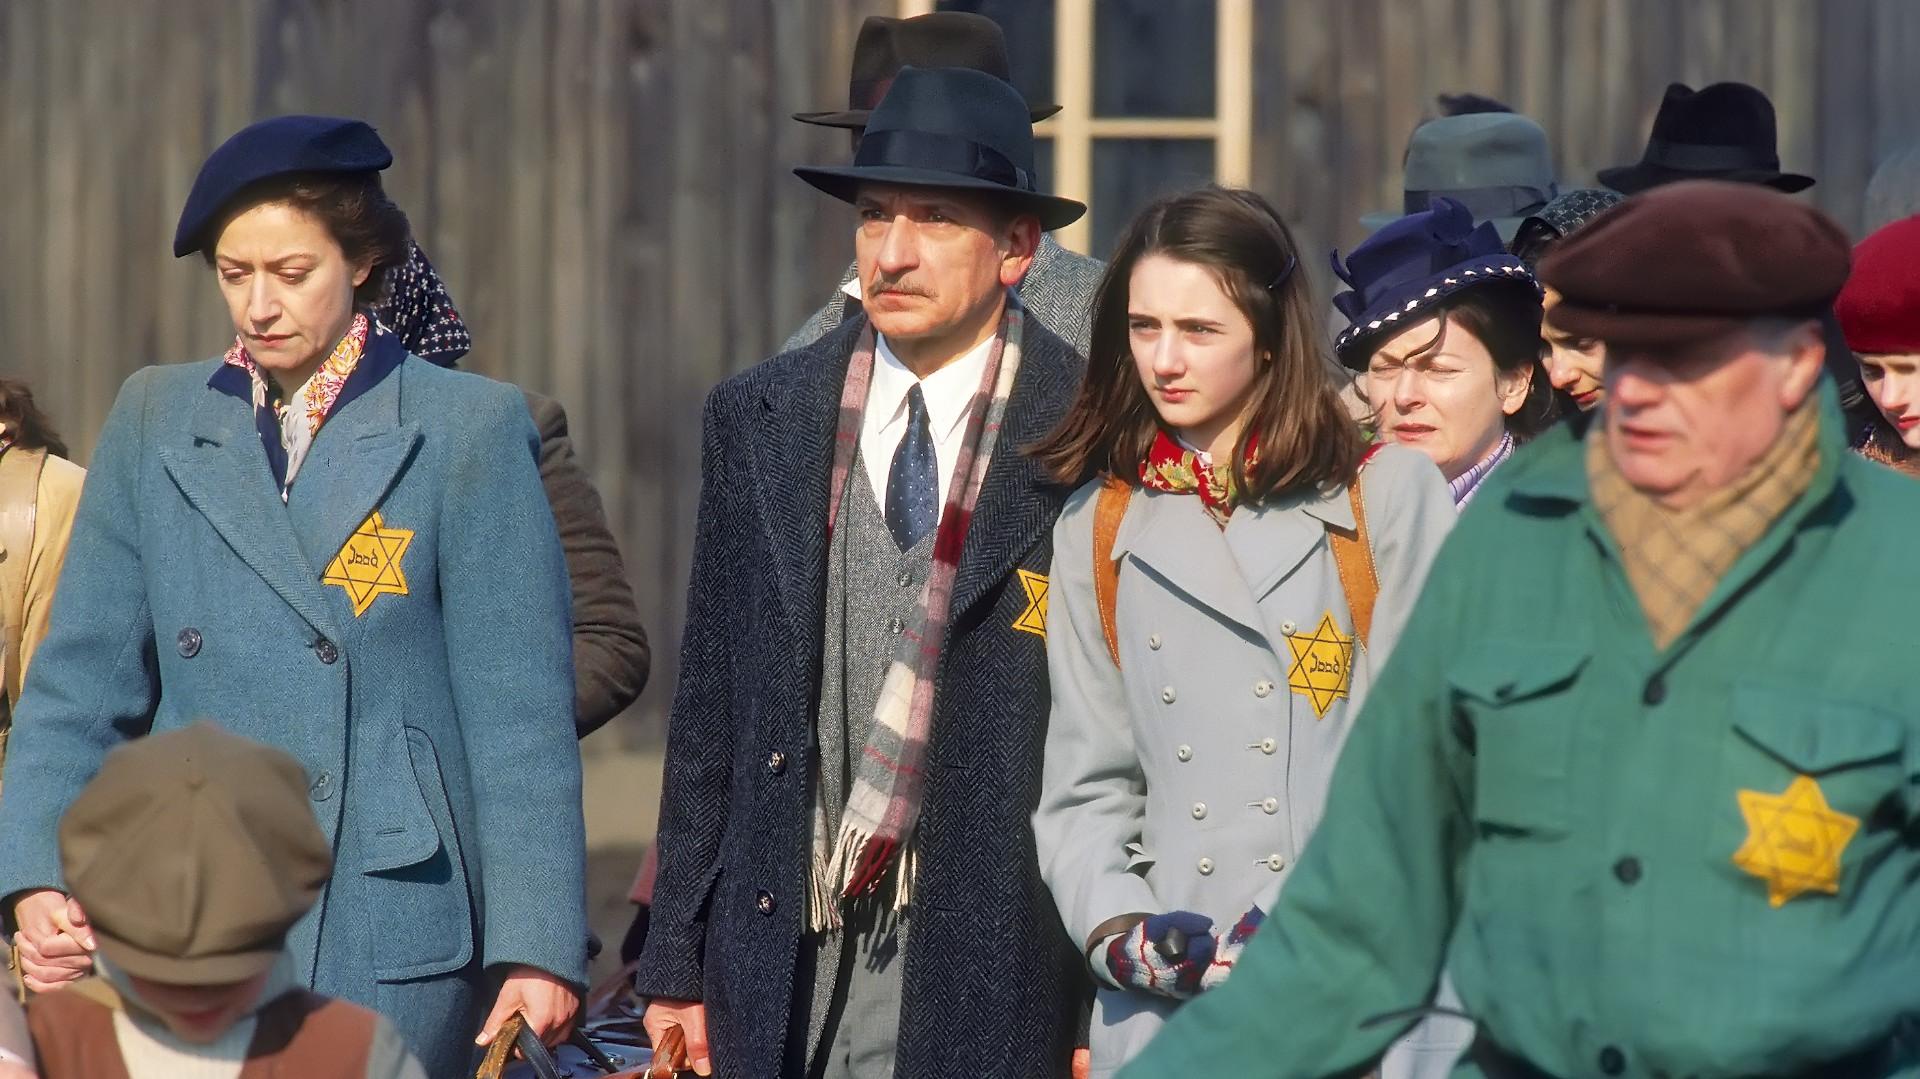 Anne-Frank-21.jpg